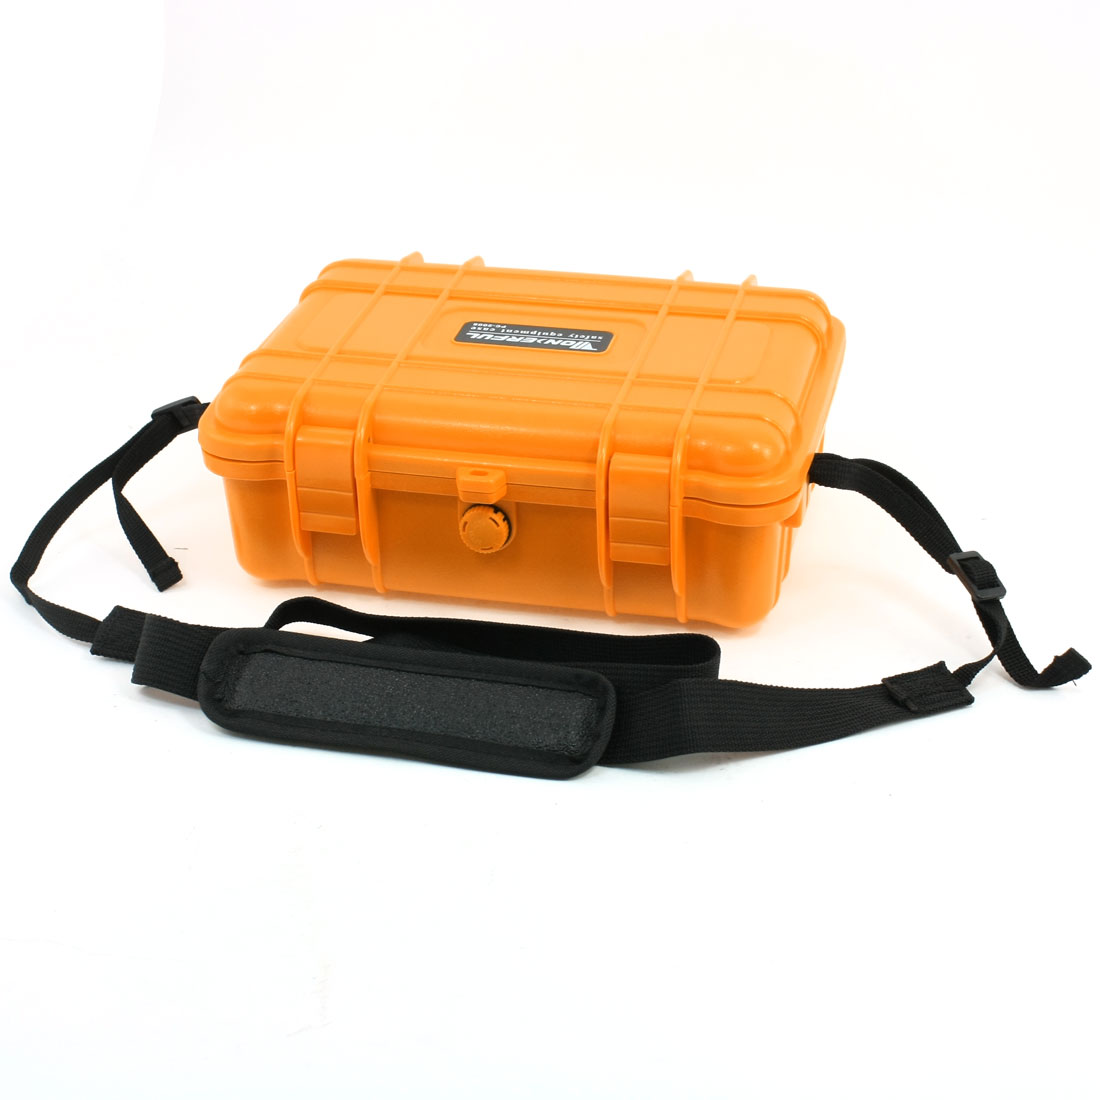 Photographic Foam Lining Safety Box Case Orange w Shoulder Strap